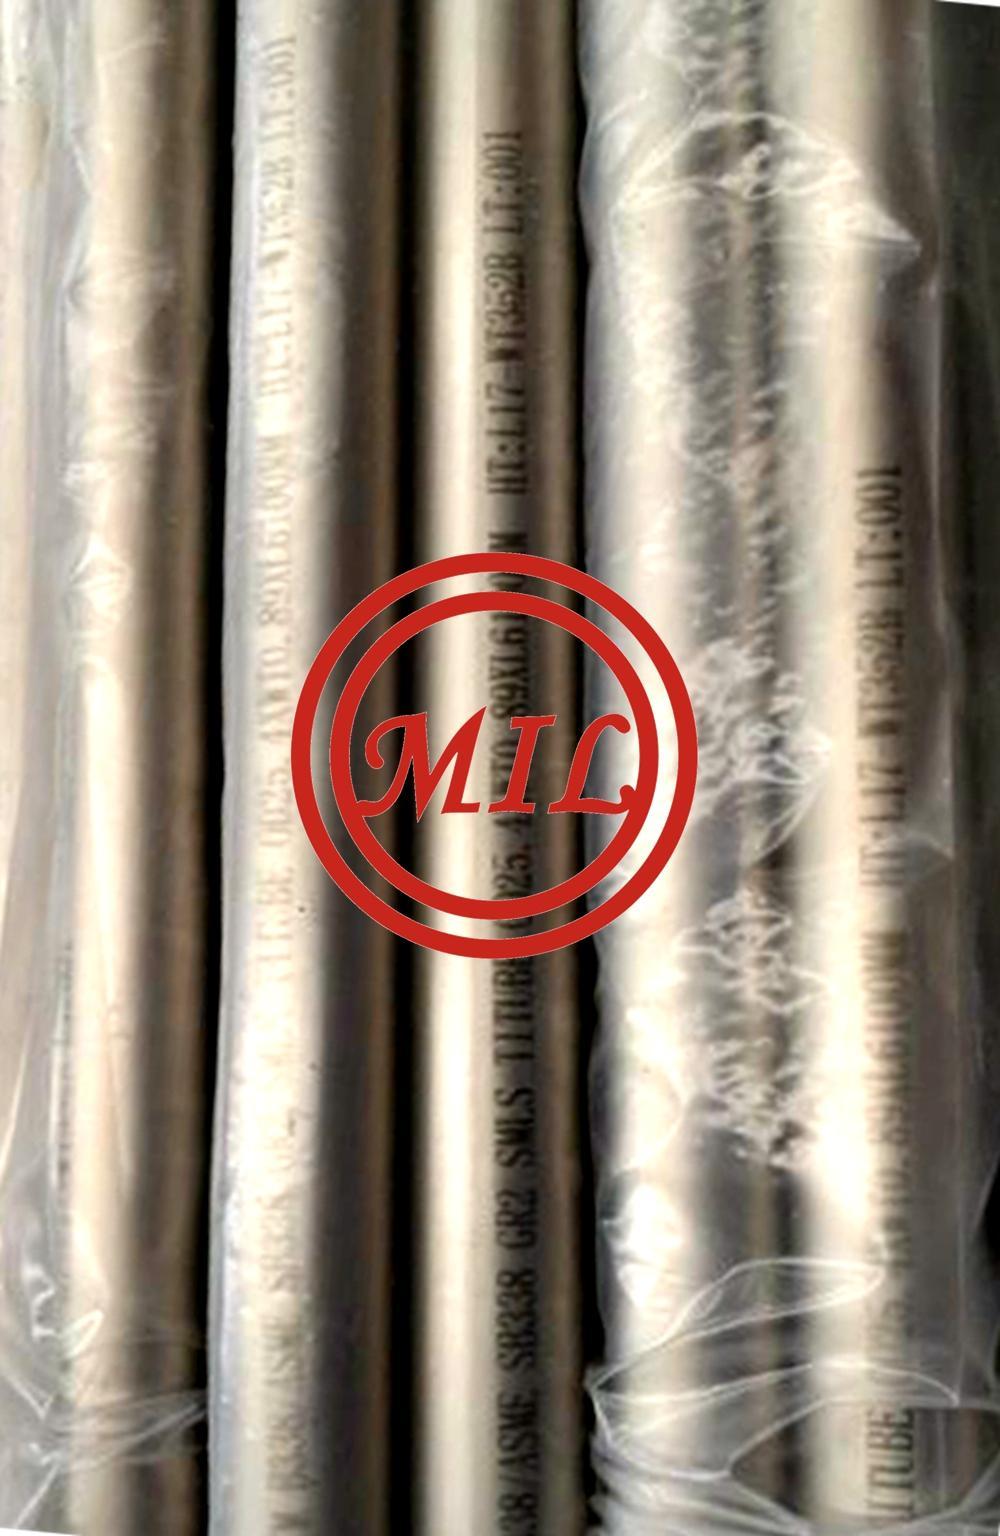 ASTM B338 Gr2  metallurgy_seamless_titanium_alloy_tube_corrosion_resistance